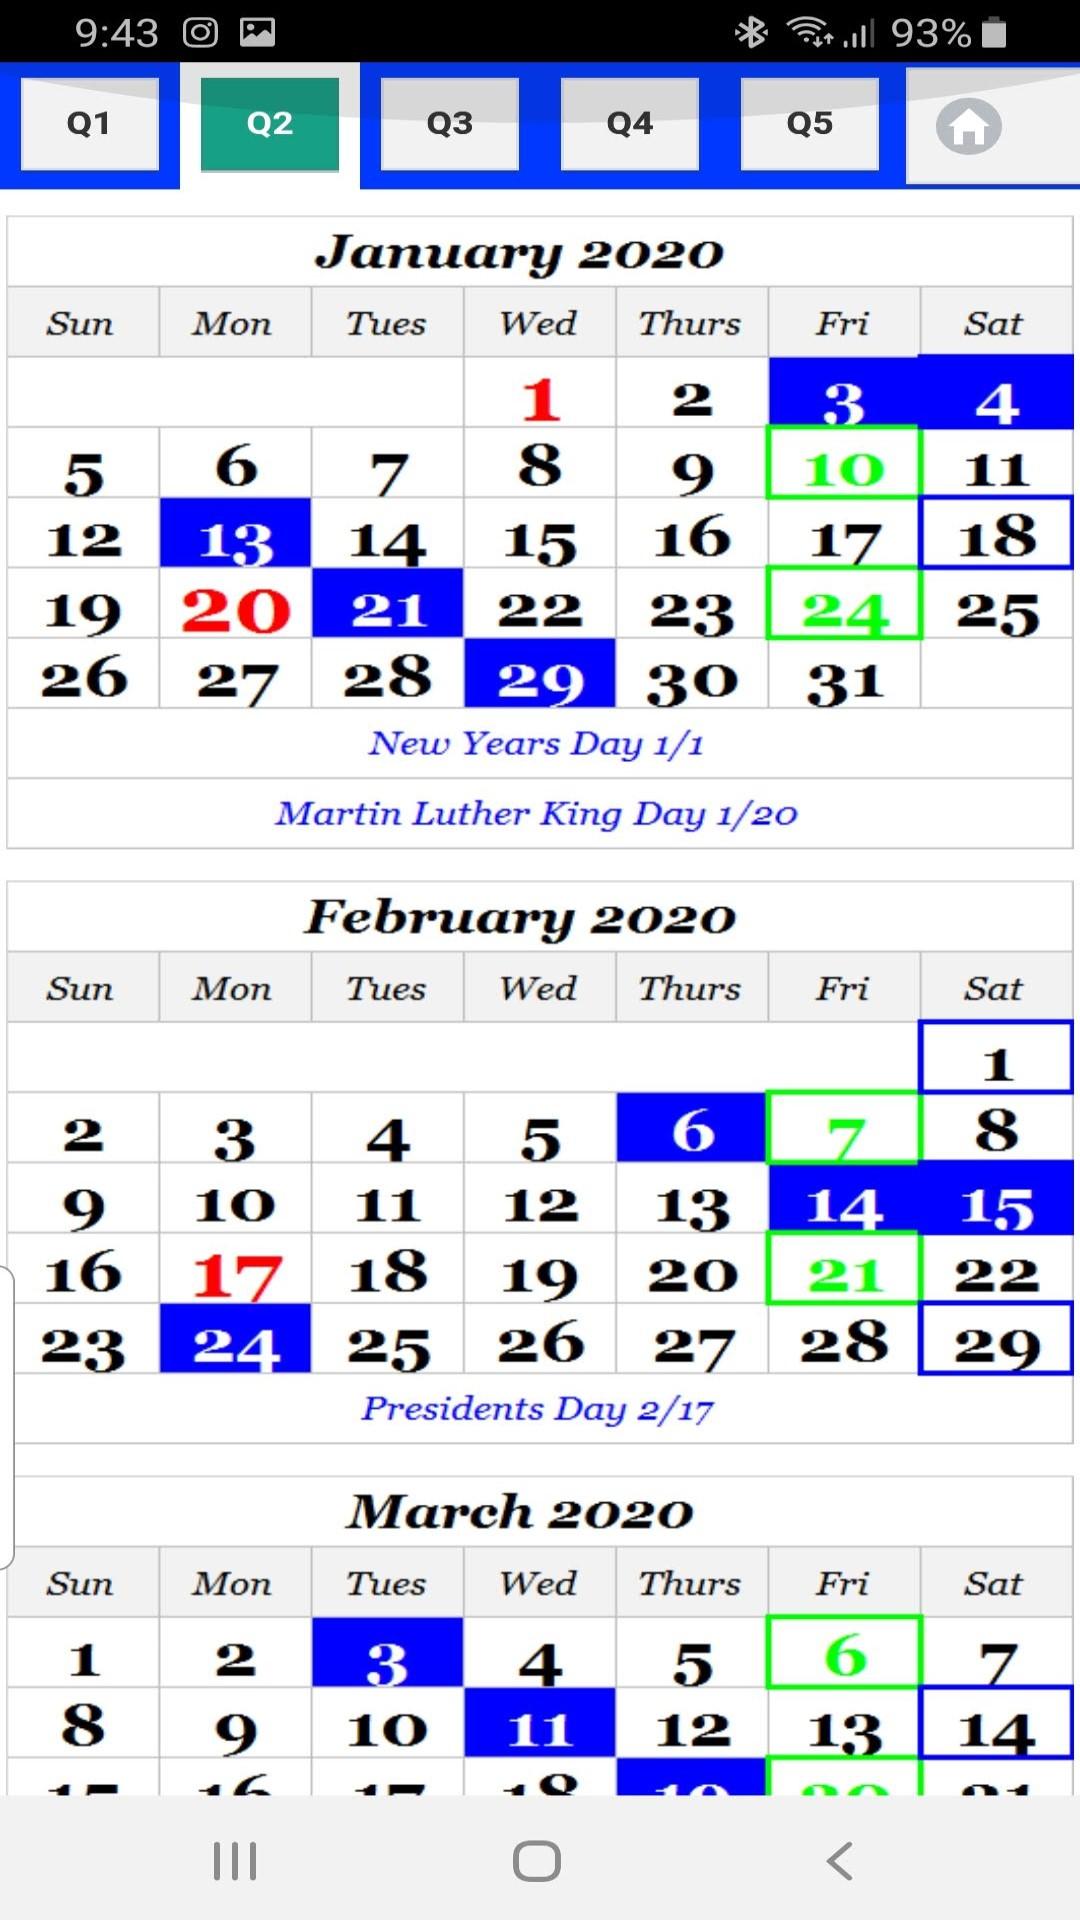 Amazon.com: 2020 USPS Carrier color coded Calendar 6 color Sunday